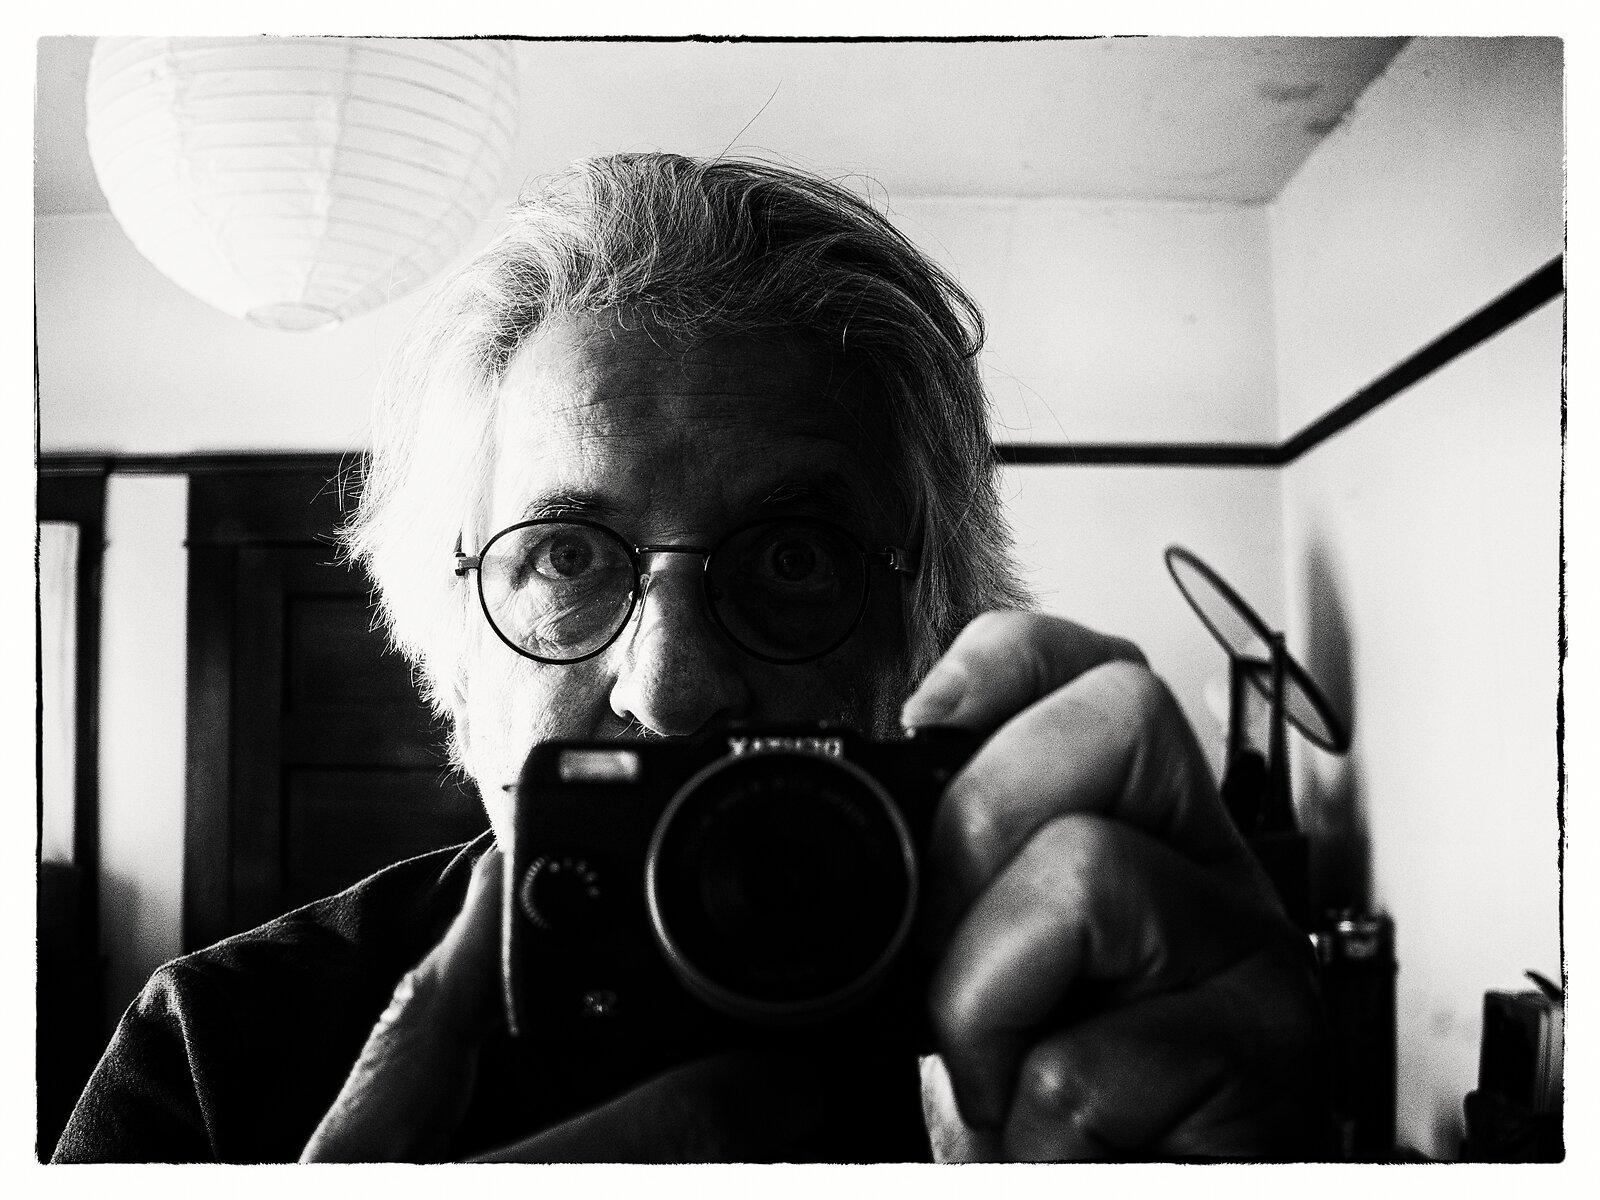 Q7_Mar4_21_autorretrato_film_noir.jpg